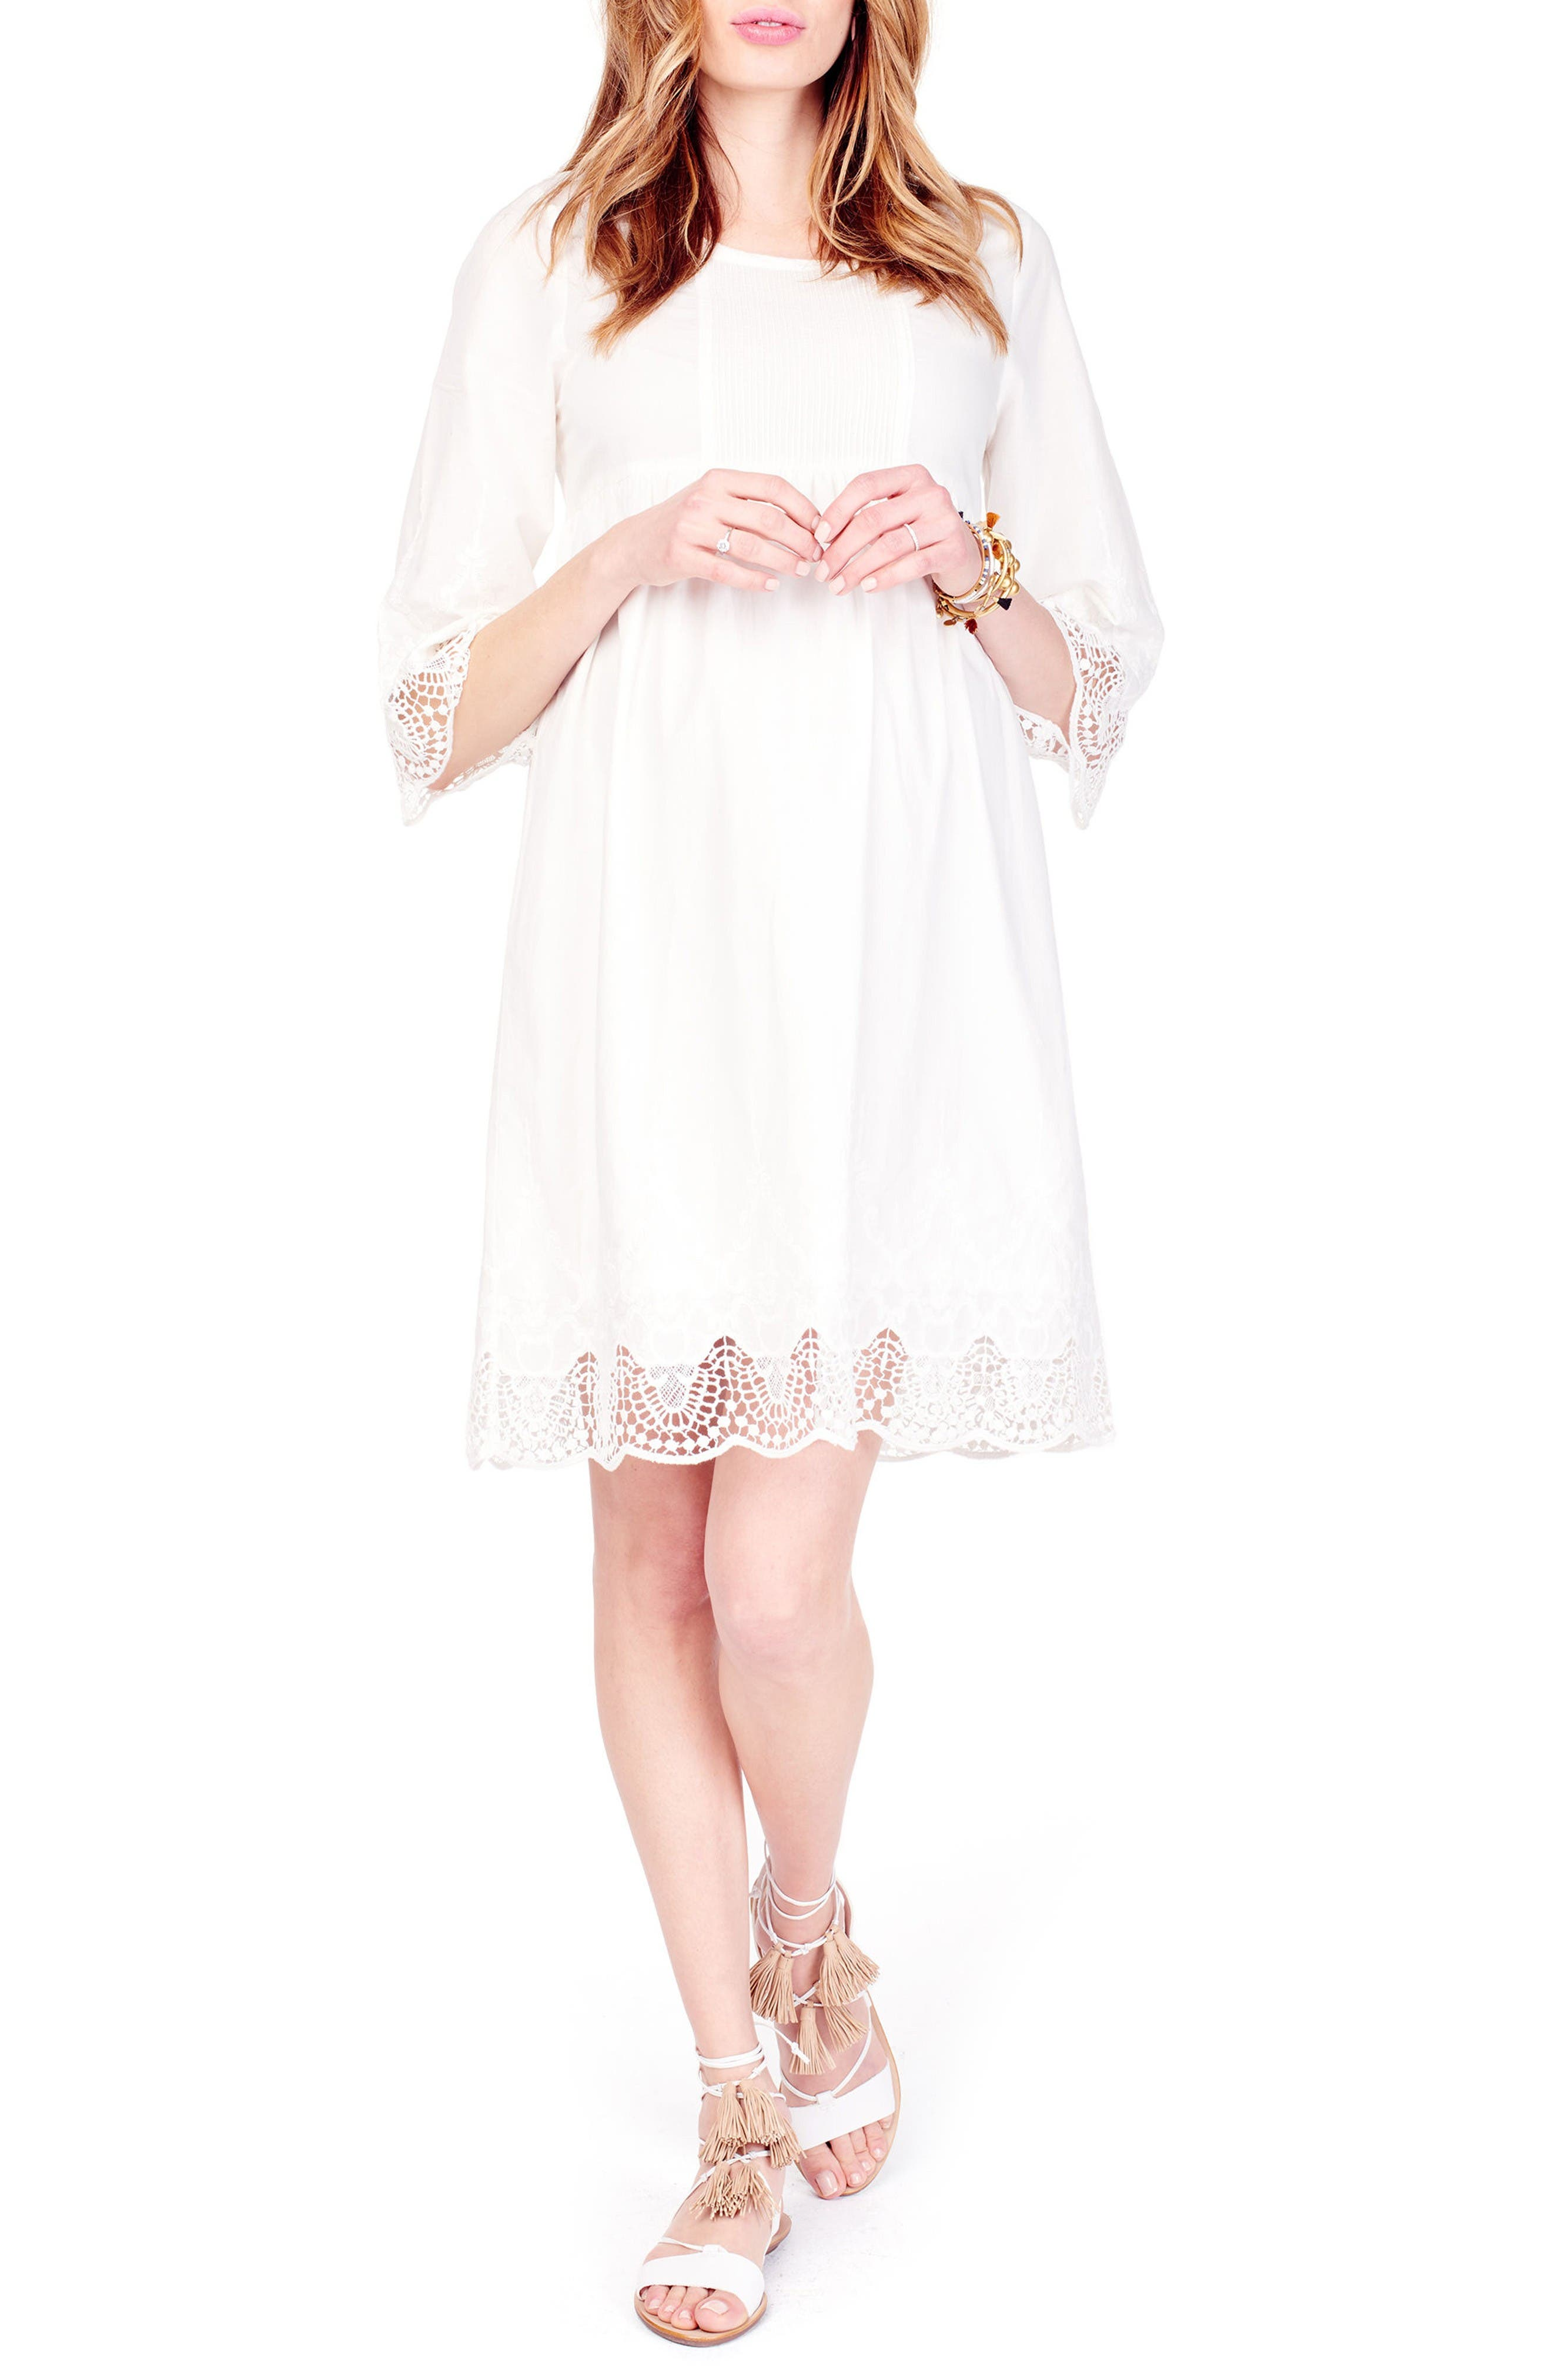 Alternate Image 1 Selected - Ingrid & Isabel® Lace Trim Maternity Dress